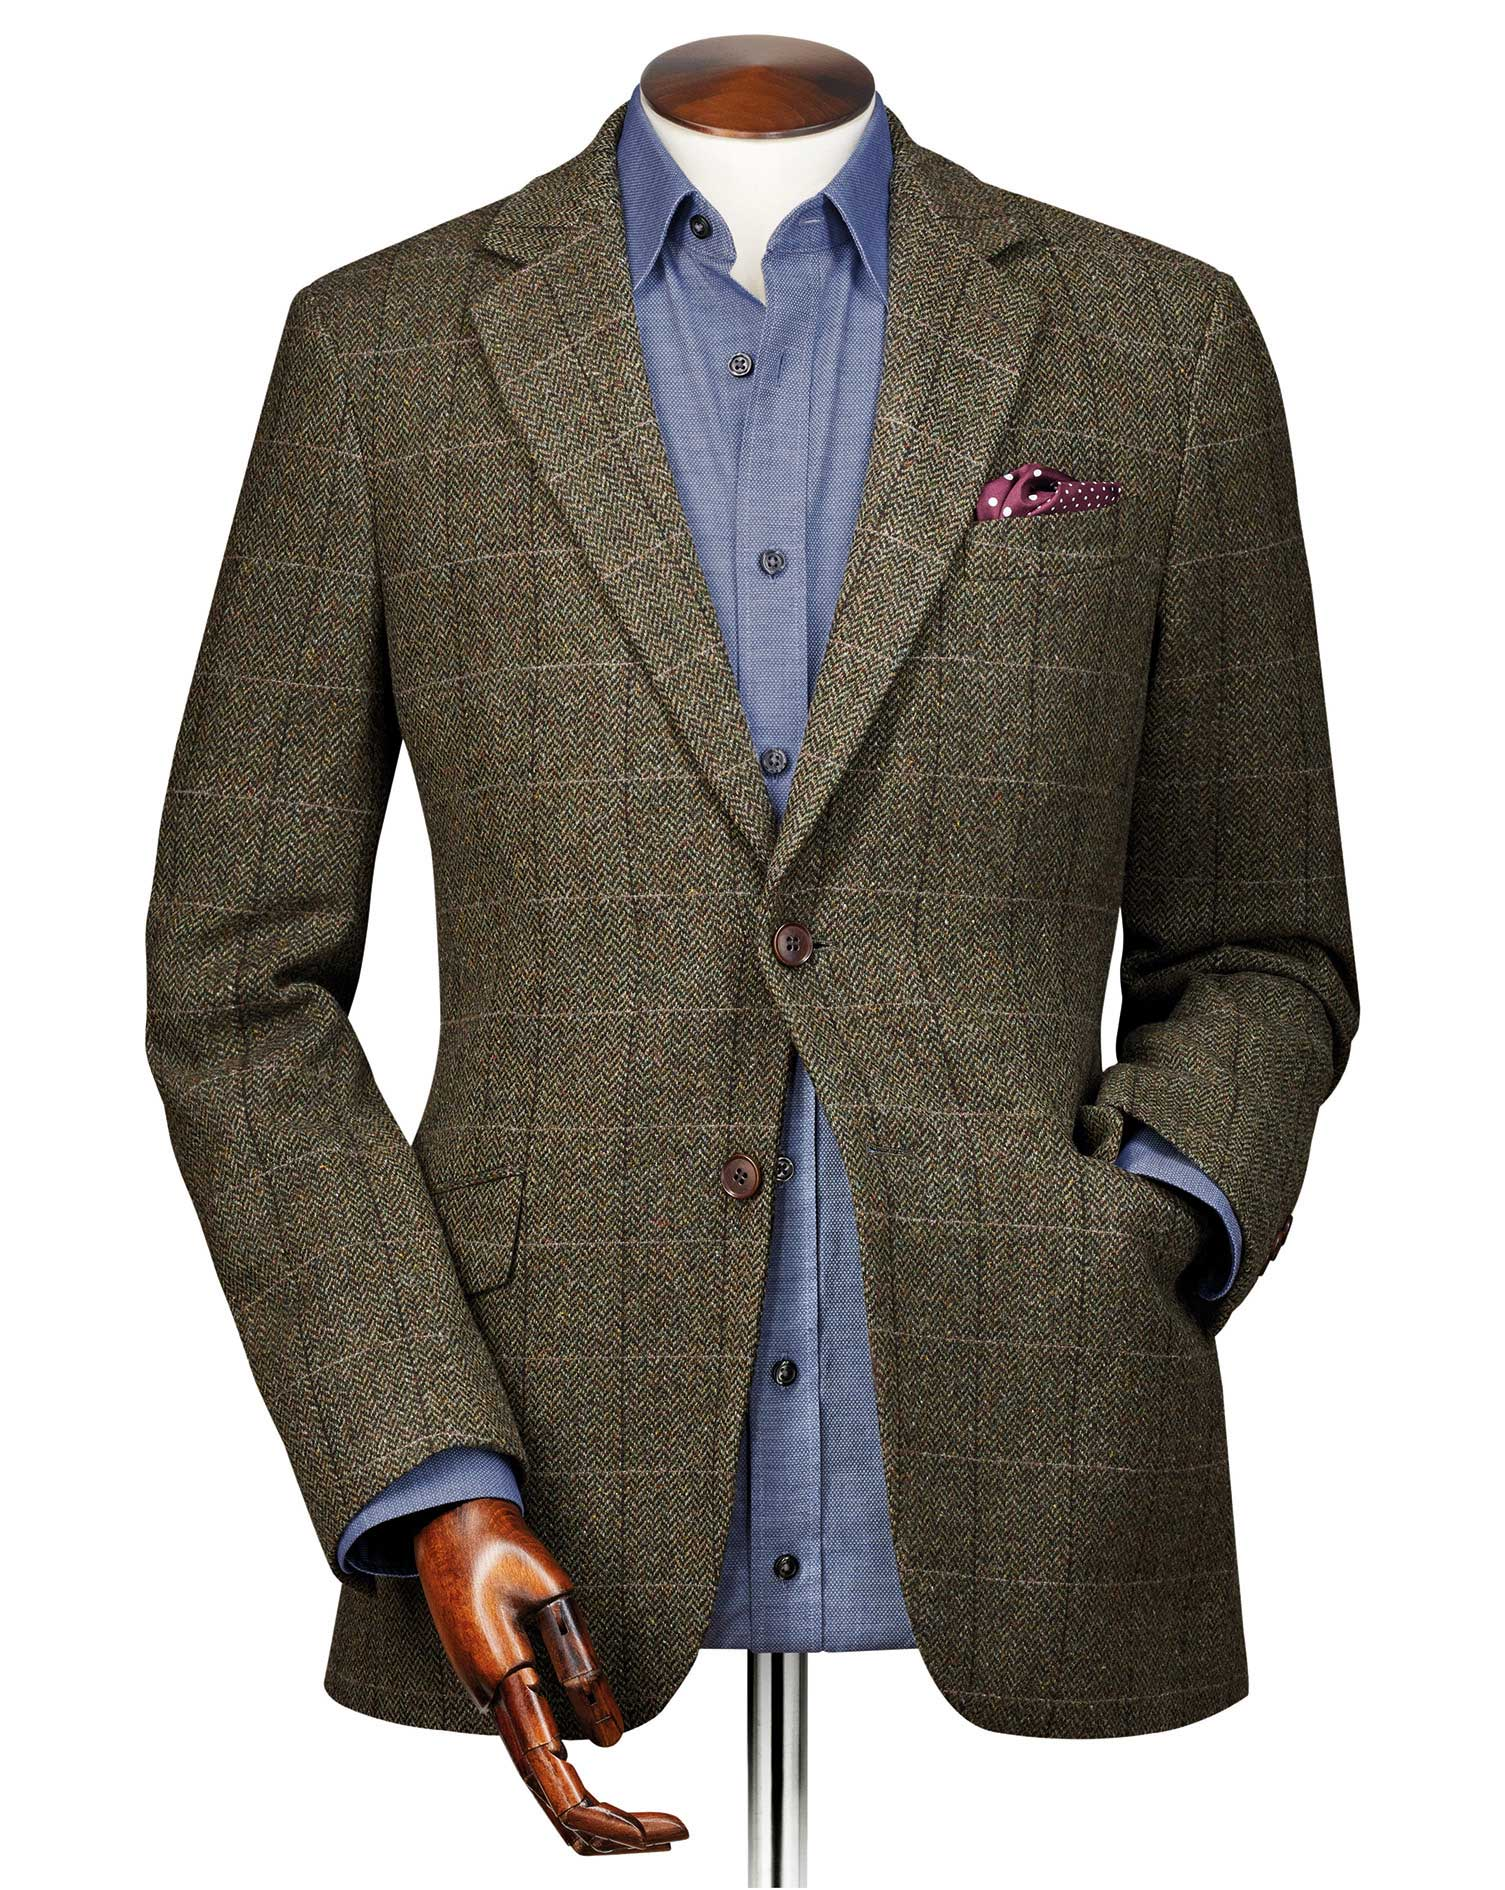 Slim Fit Green Herringbone Checkered Wool Jacket Size 46 Regular by Charles Tyrwhitt